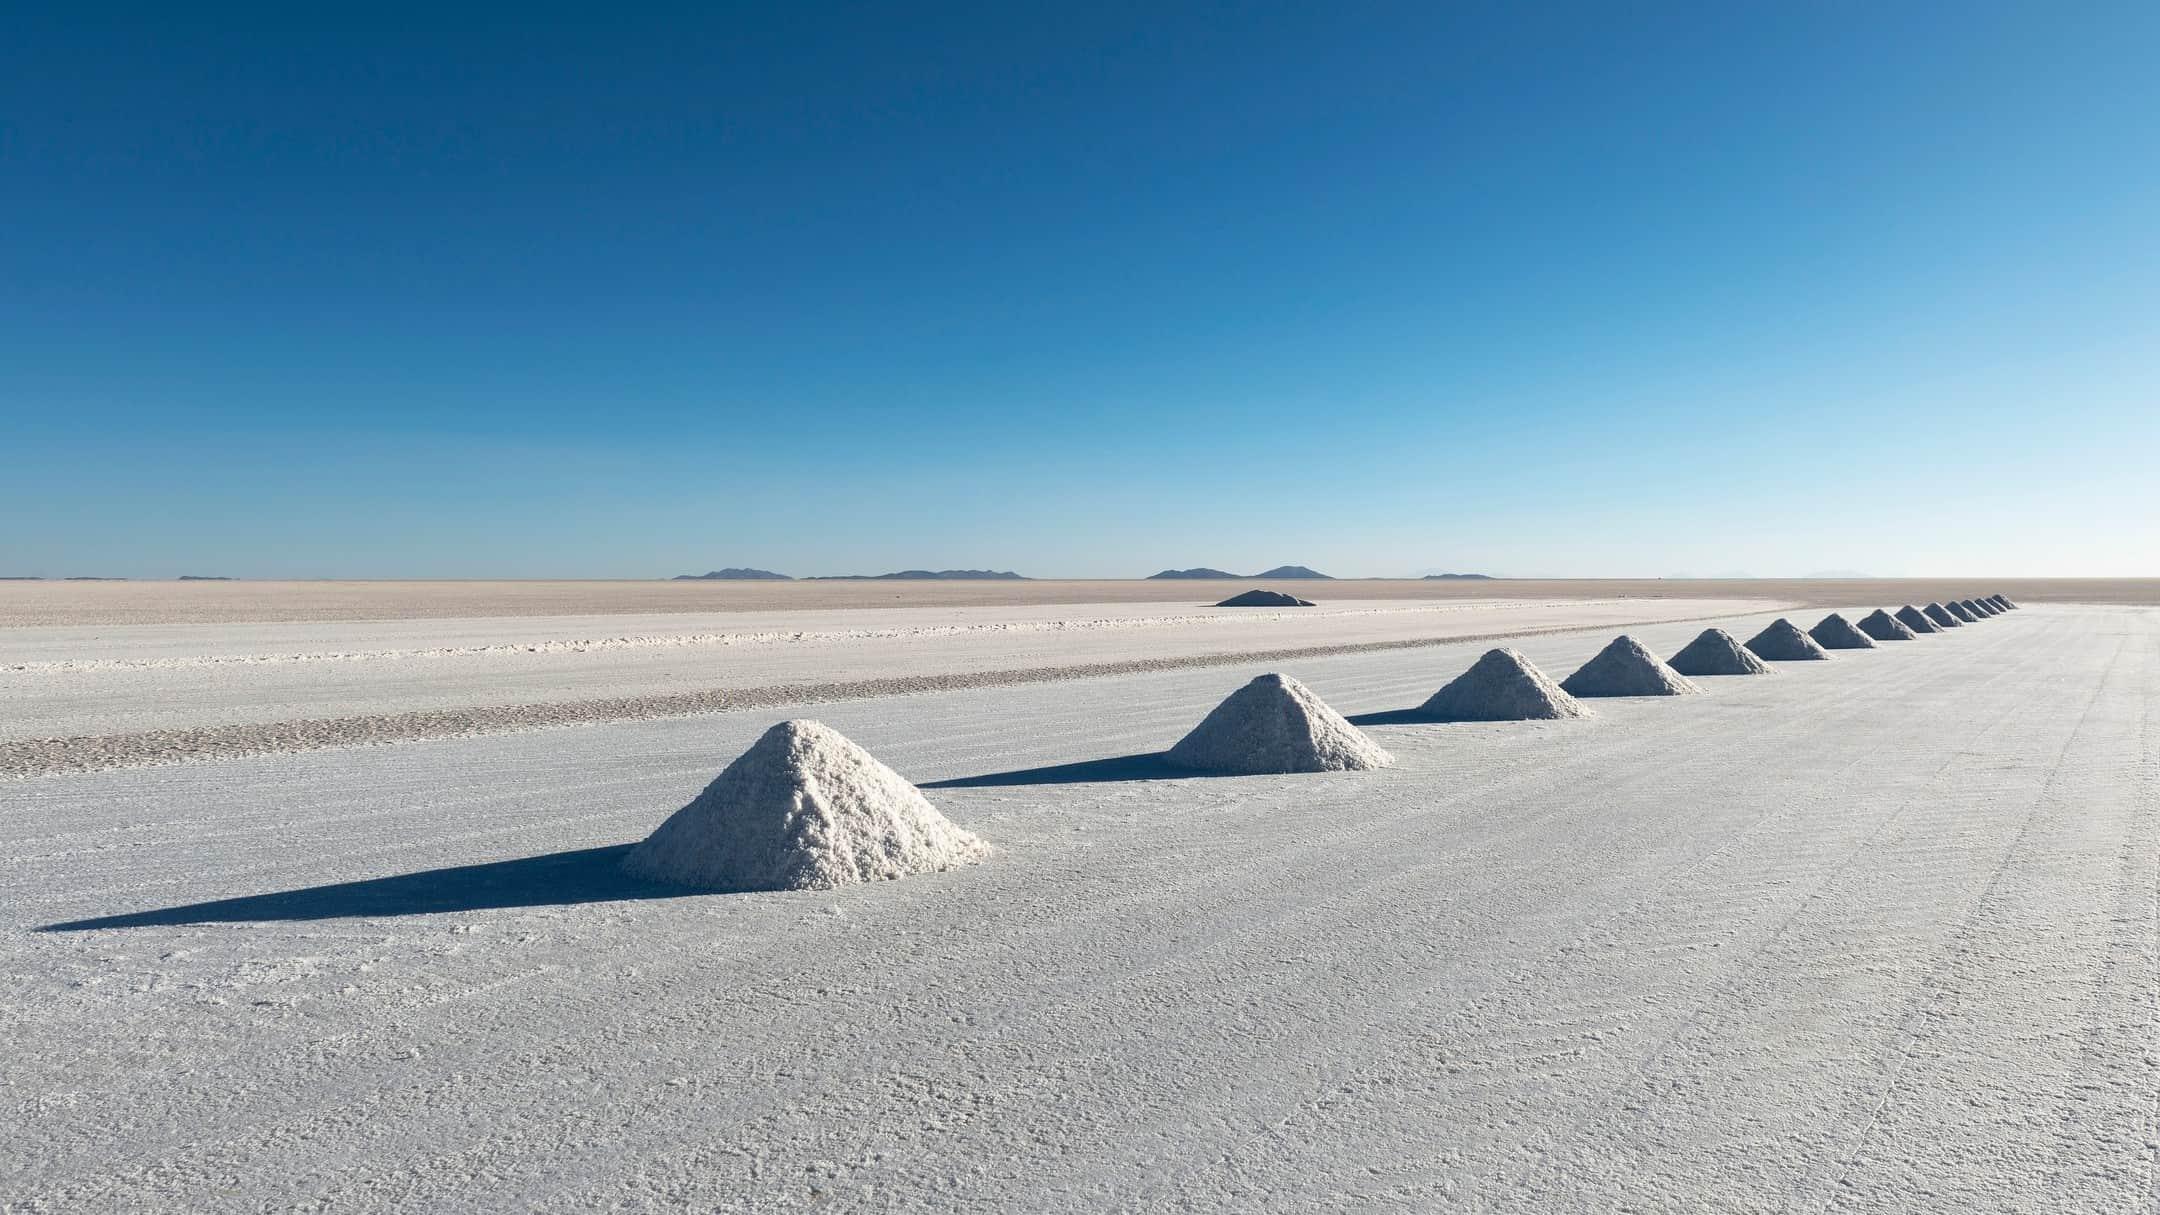 Lithium mineral deposits